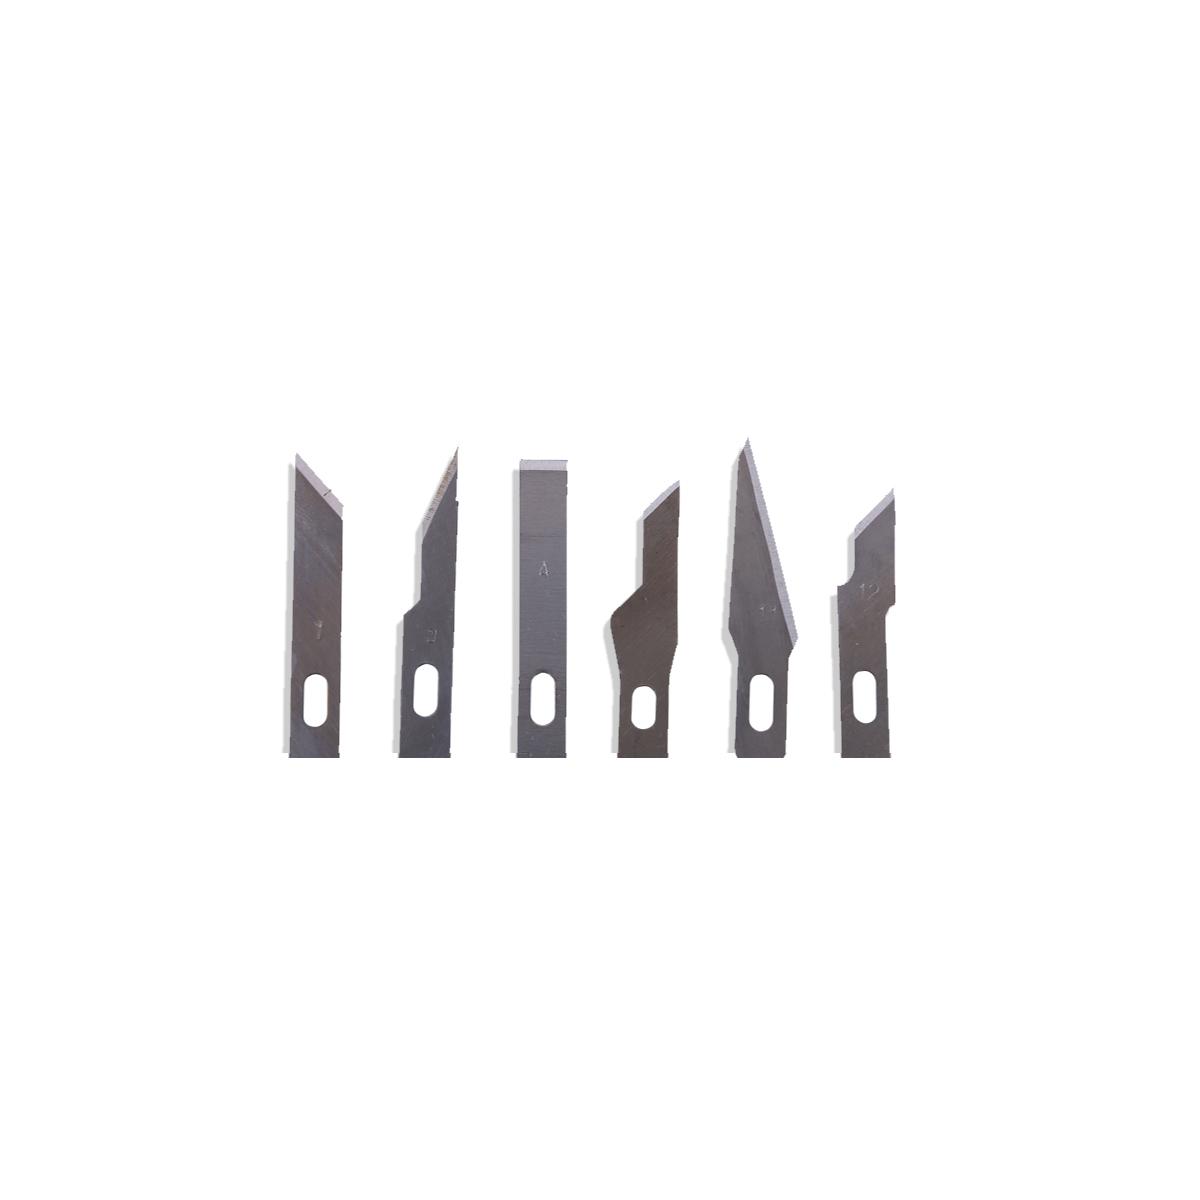 CRAFT Cutting Knife - Model Making Art Blade X-ACTO Hobby Razor 6